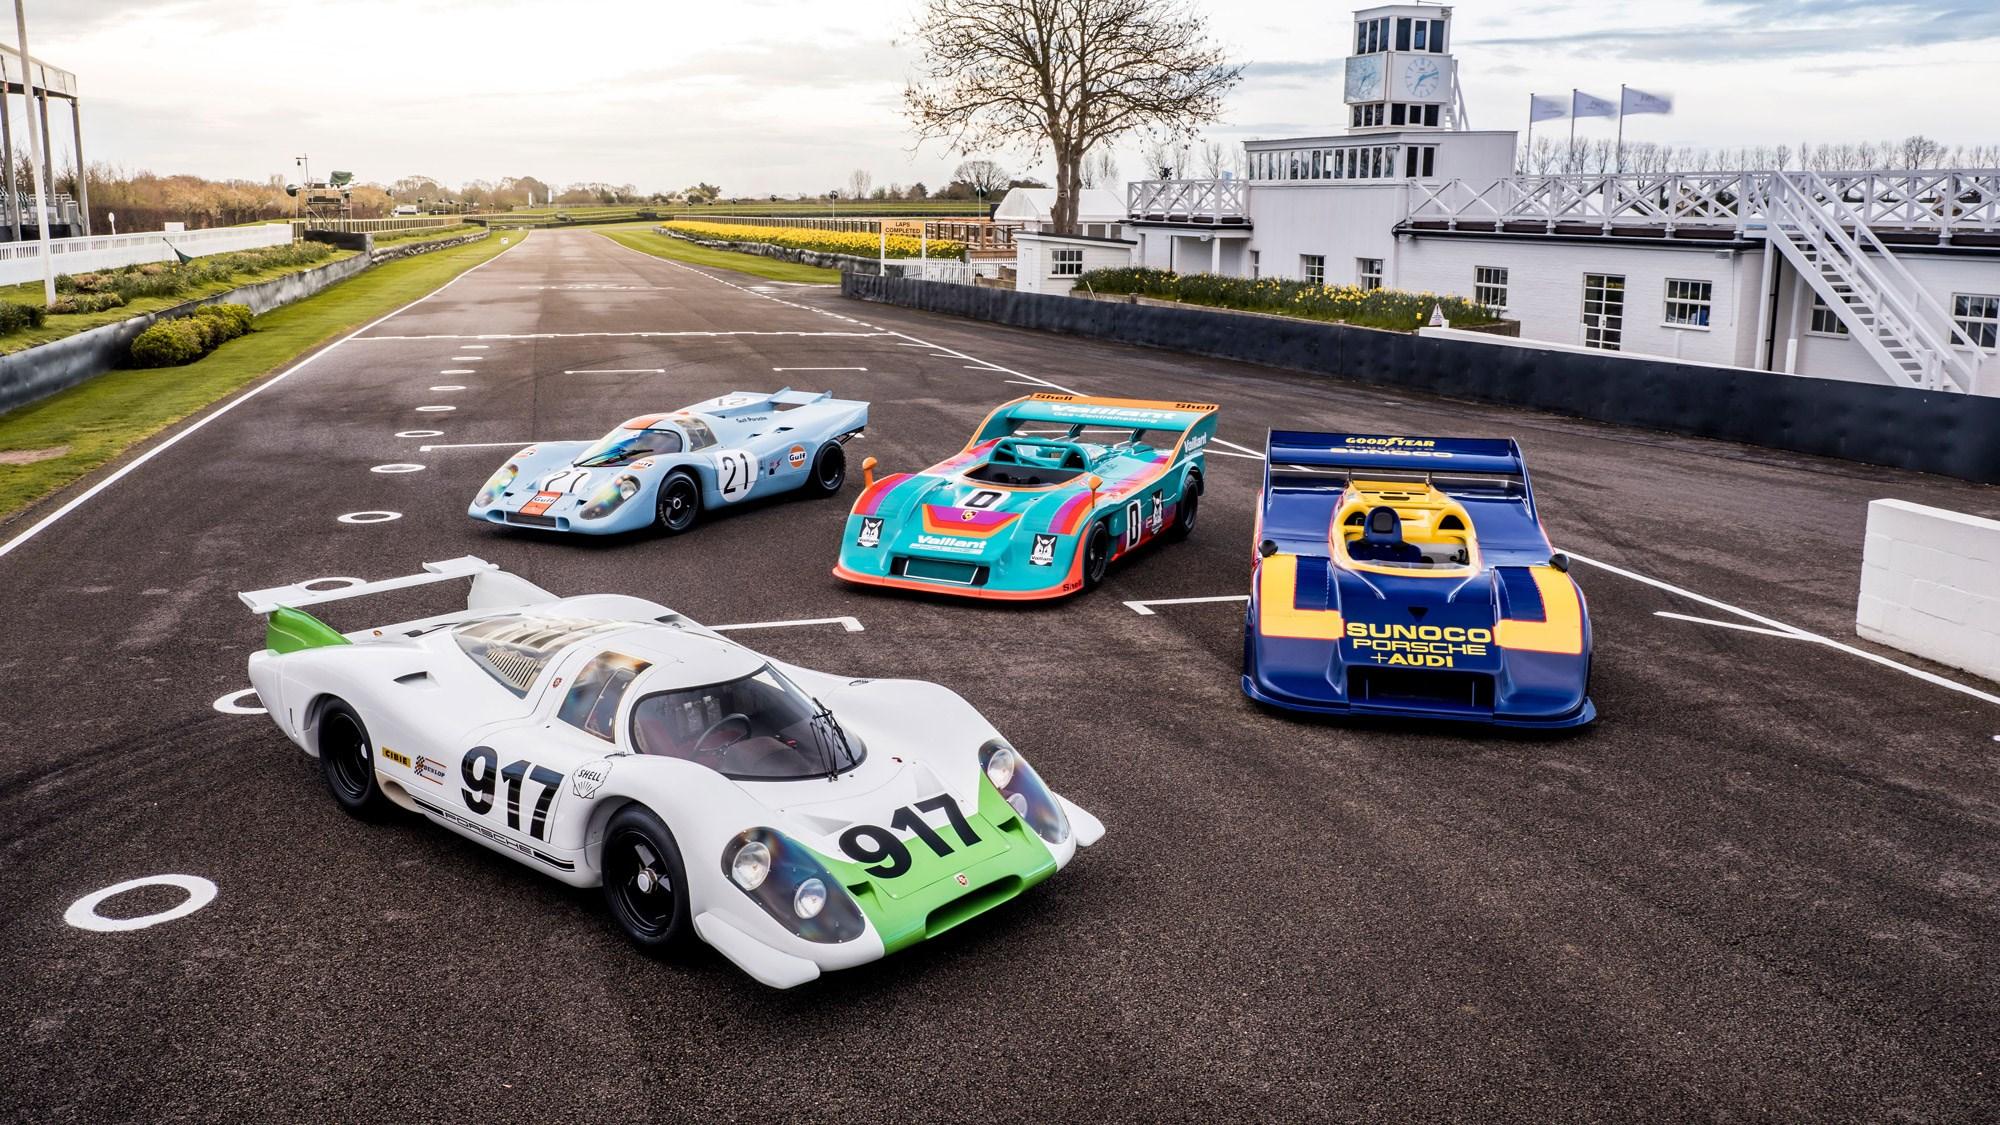 Porsche 917 For Sale >> Porsche 917 At 50 Restoring Chassis 001 Car Magazine